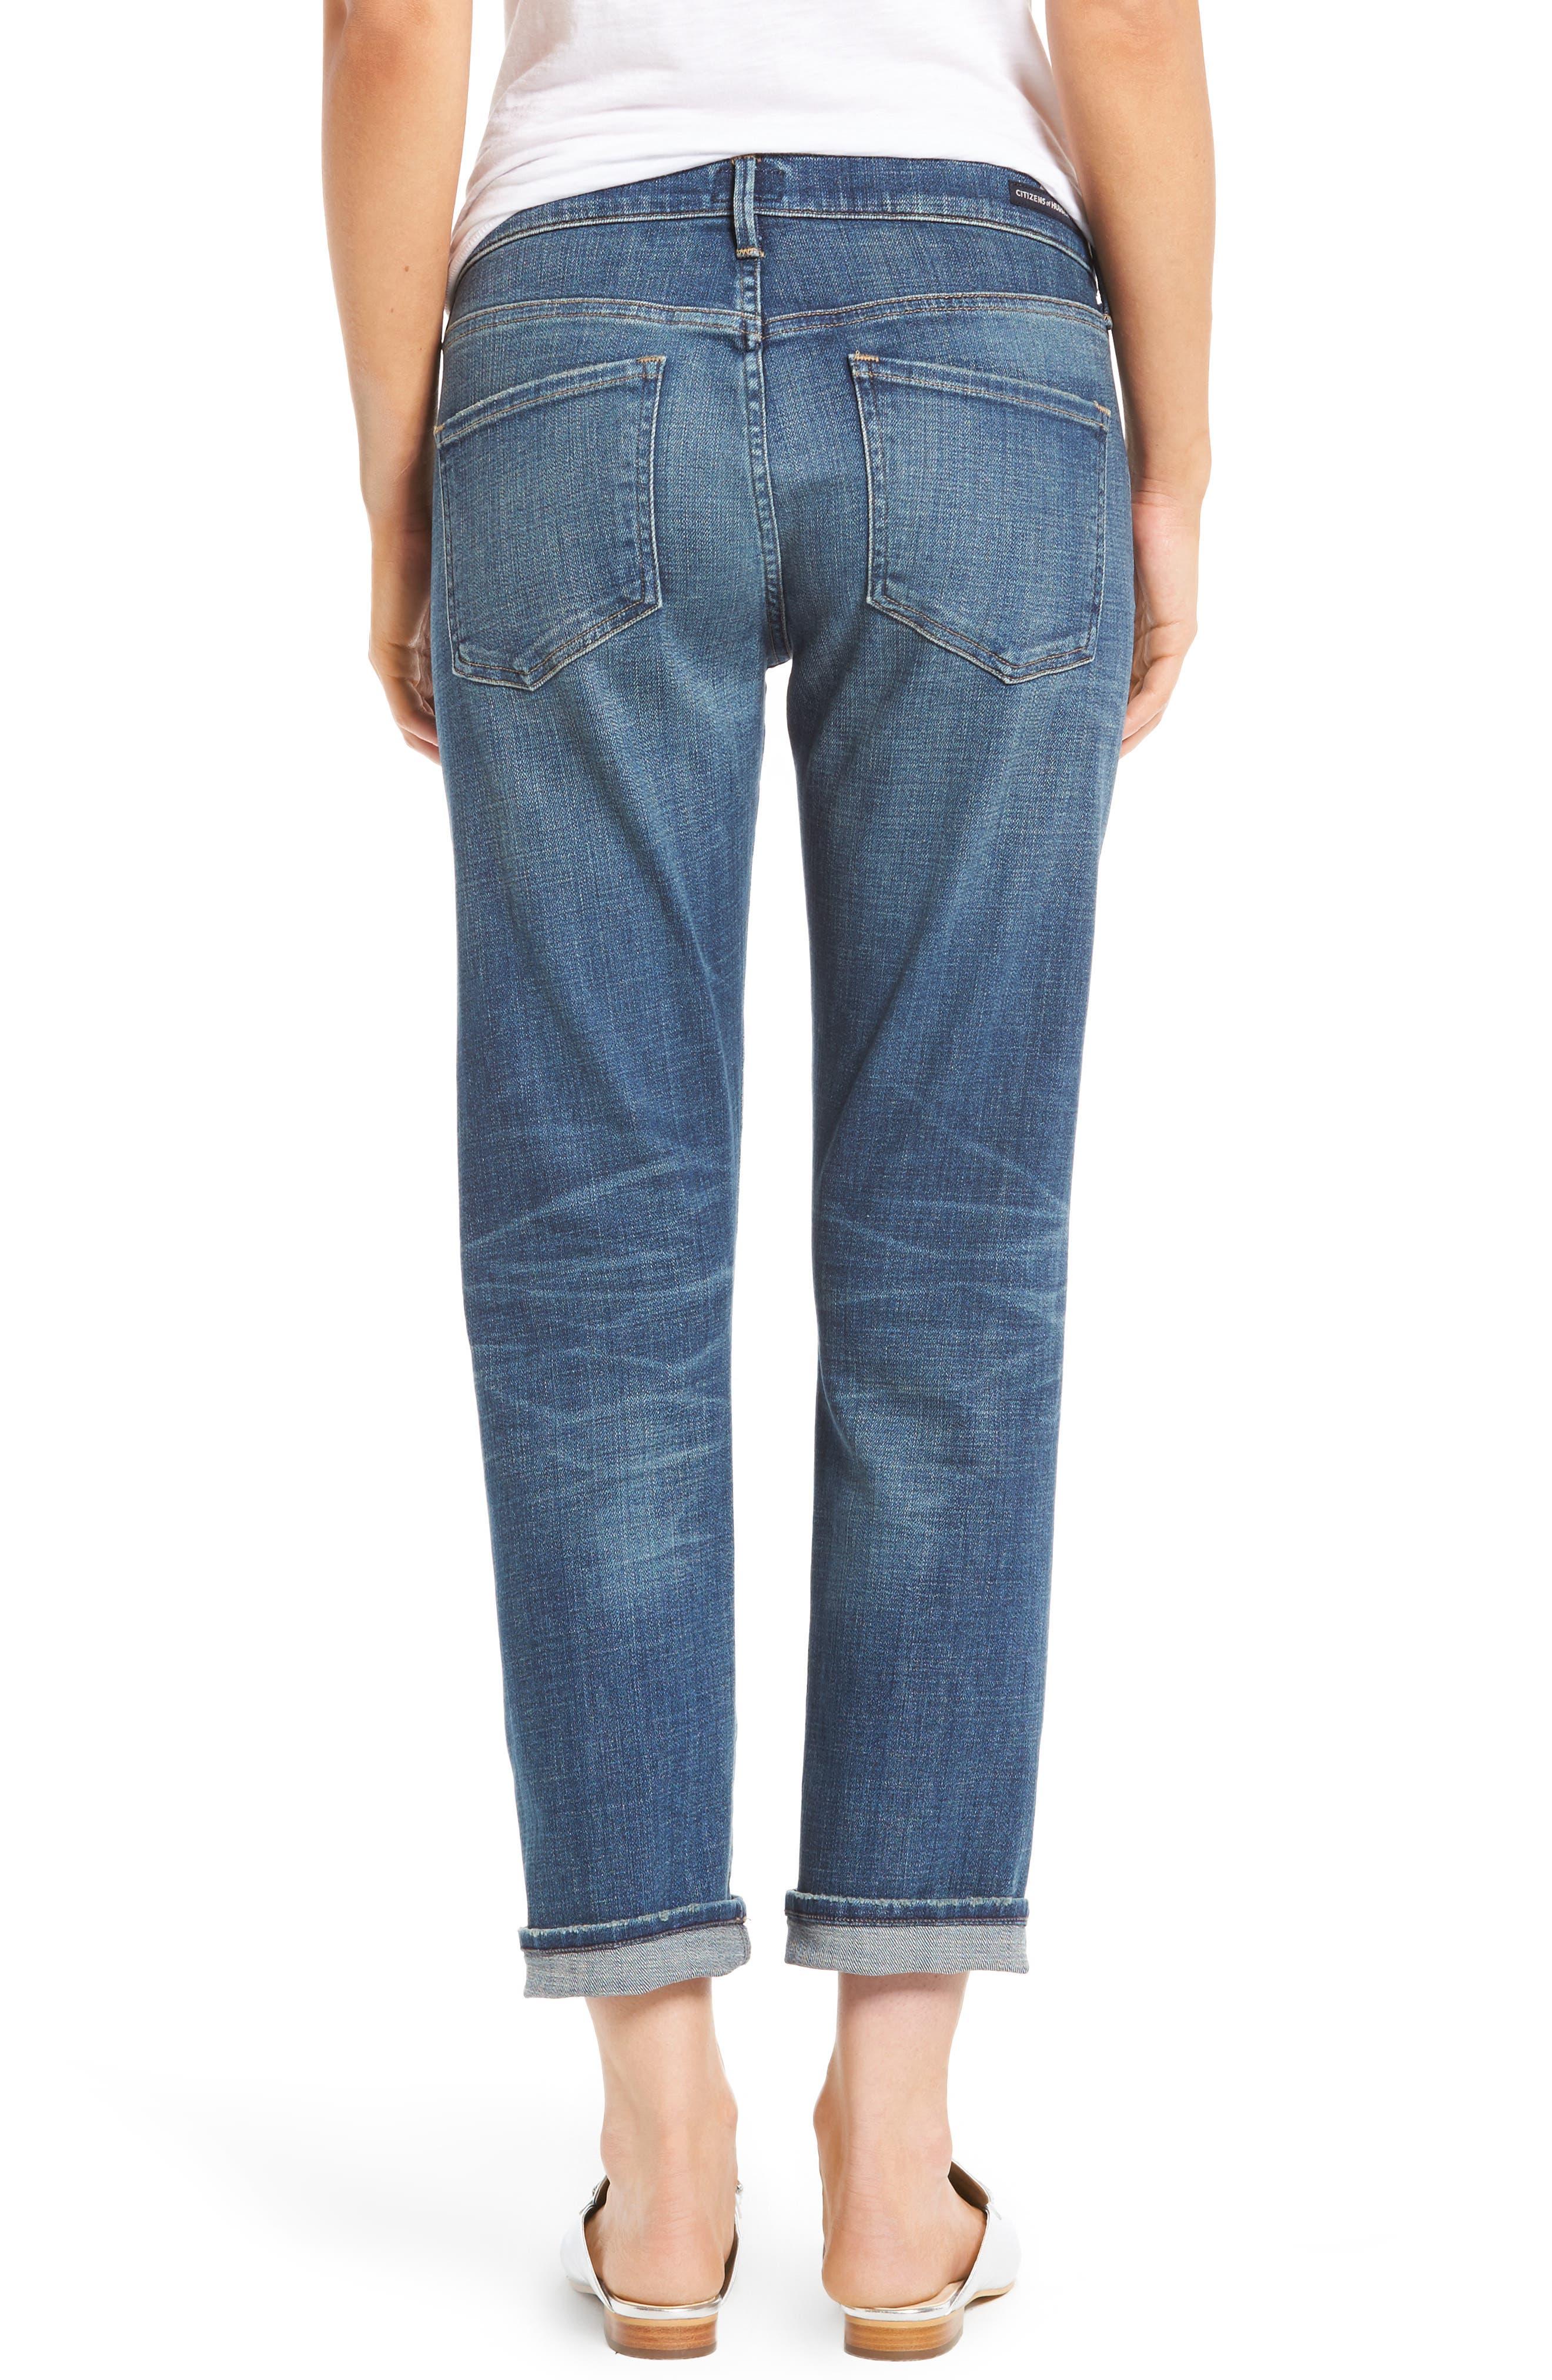 Alternate Image 2  - Citizens of Humanity Emerson Slim Boyfriend Jeans (Crusade)